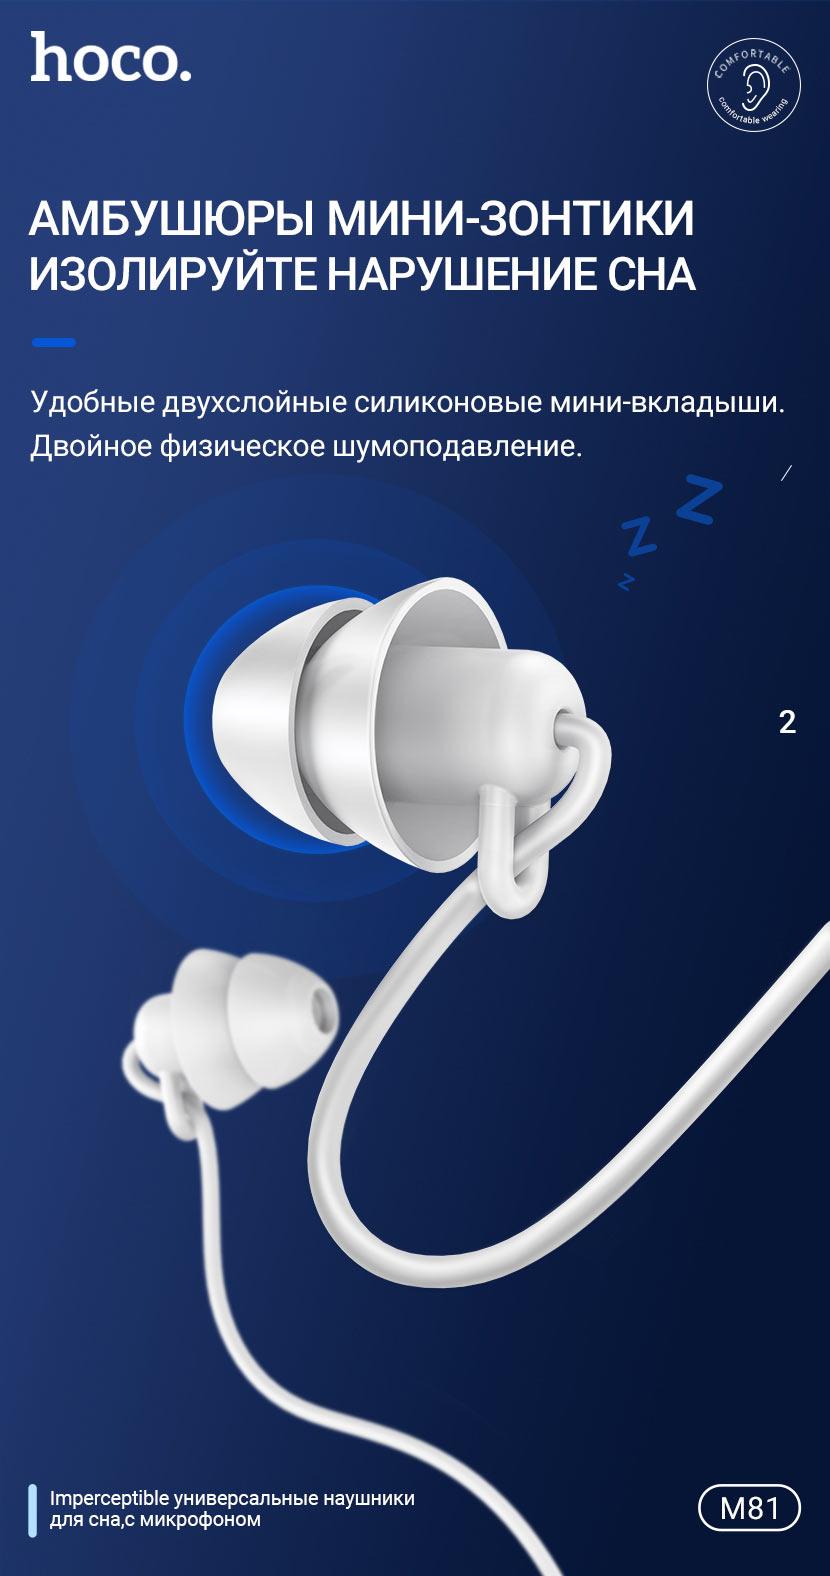 hoco news m81 imperceptible sleeping earphones with mic ear caps ru